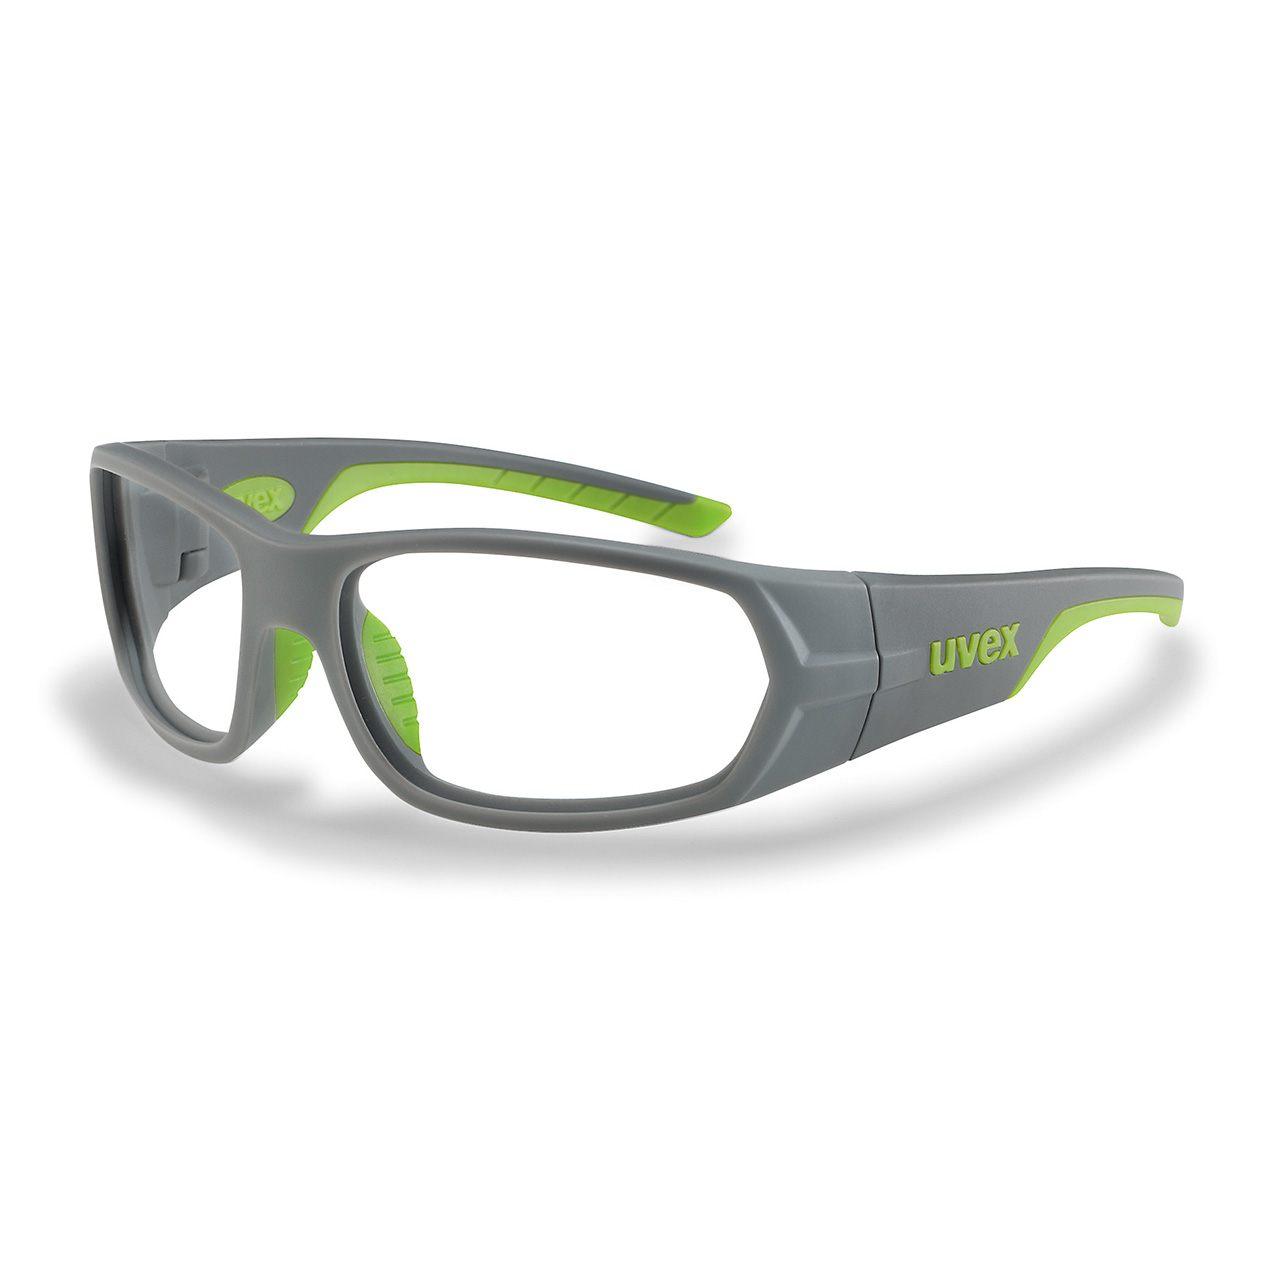 f1a96fe977 Uvex Rx Sp 5513 Prescription Safety Glasses Prescription Eyewear